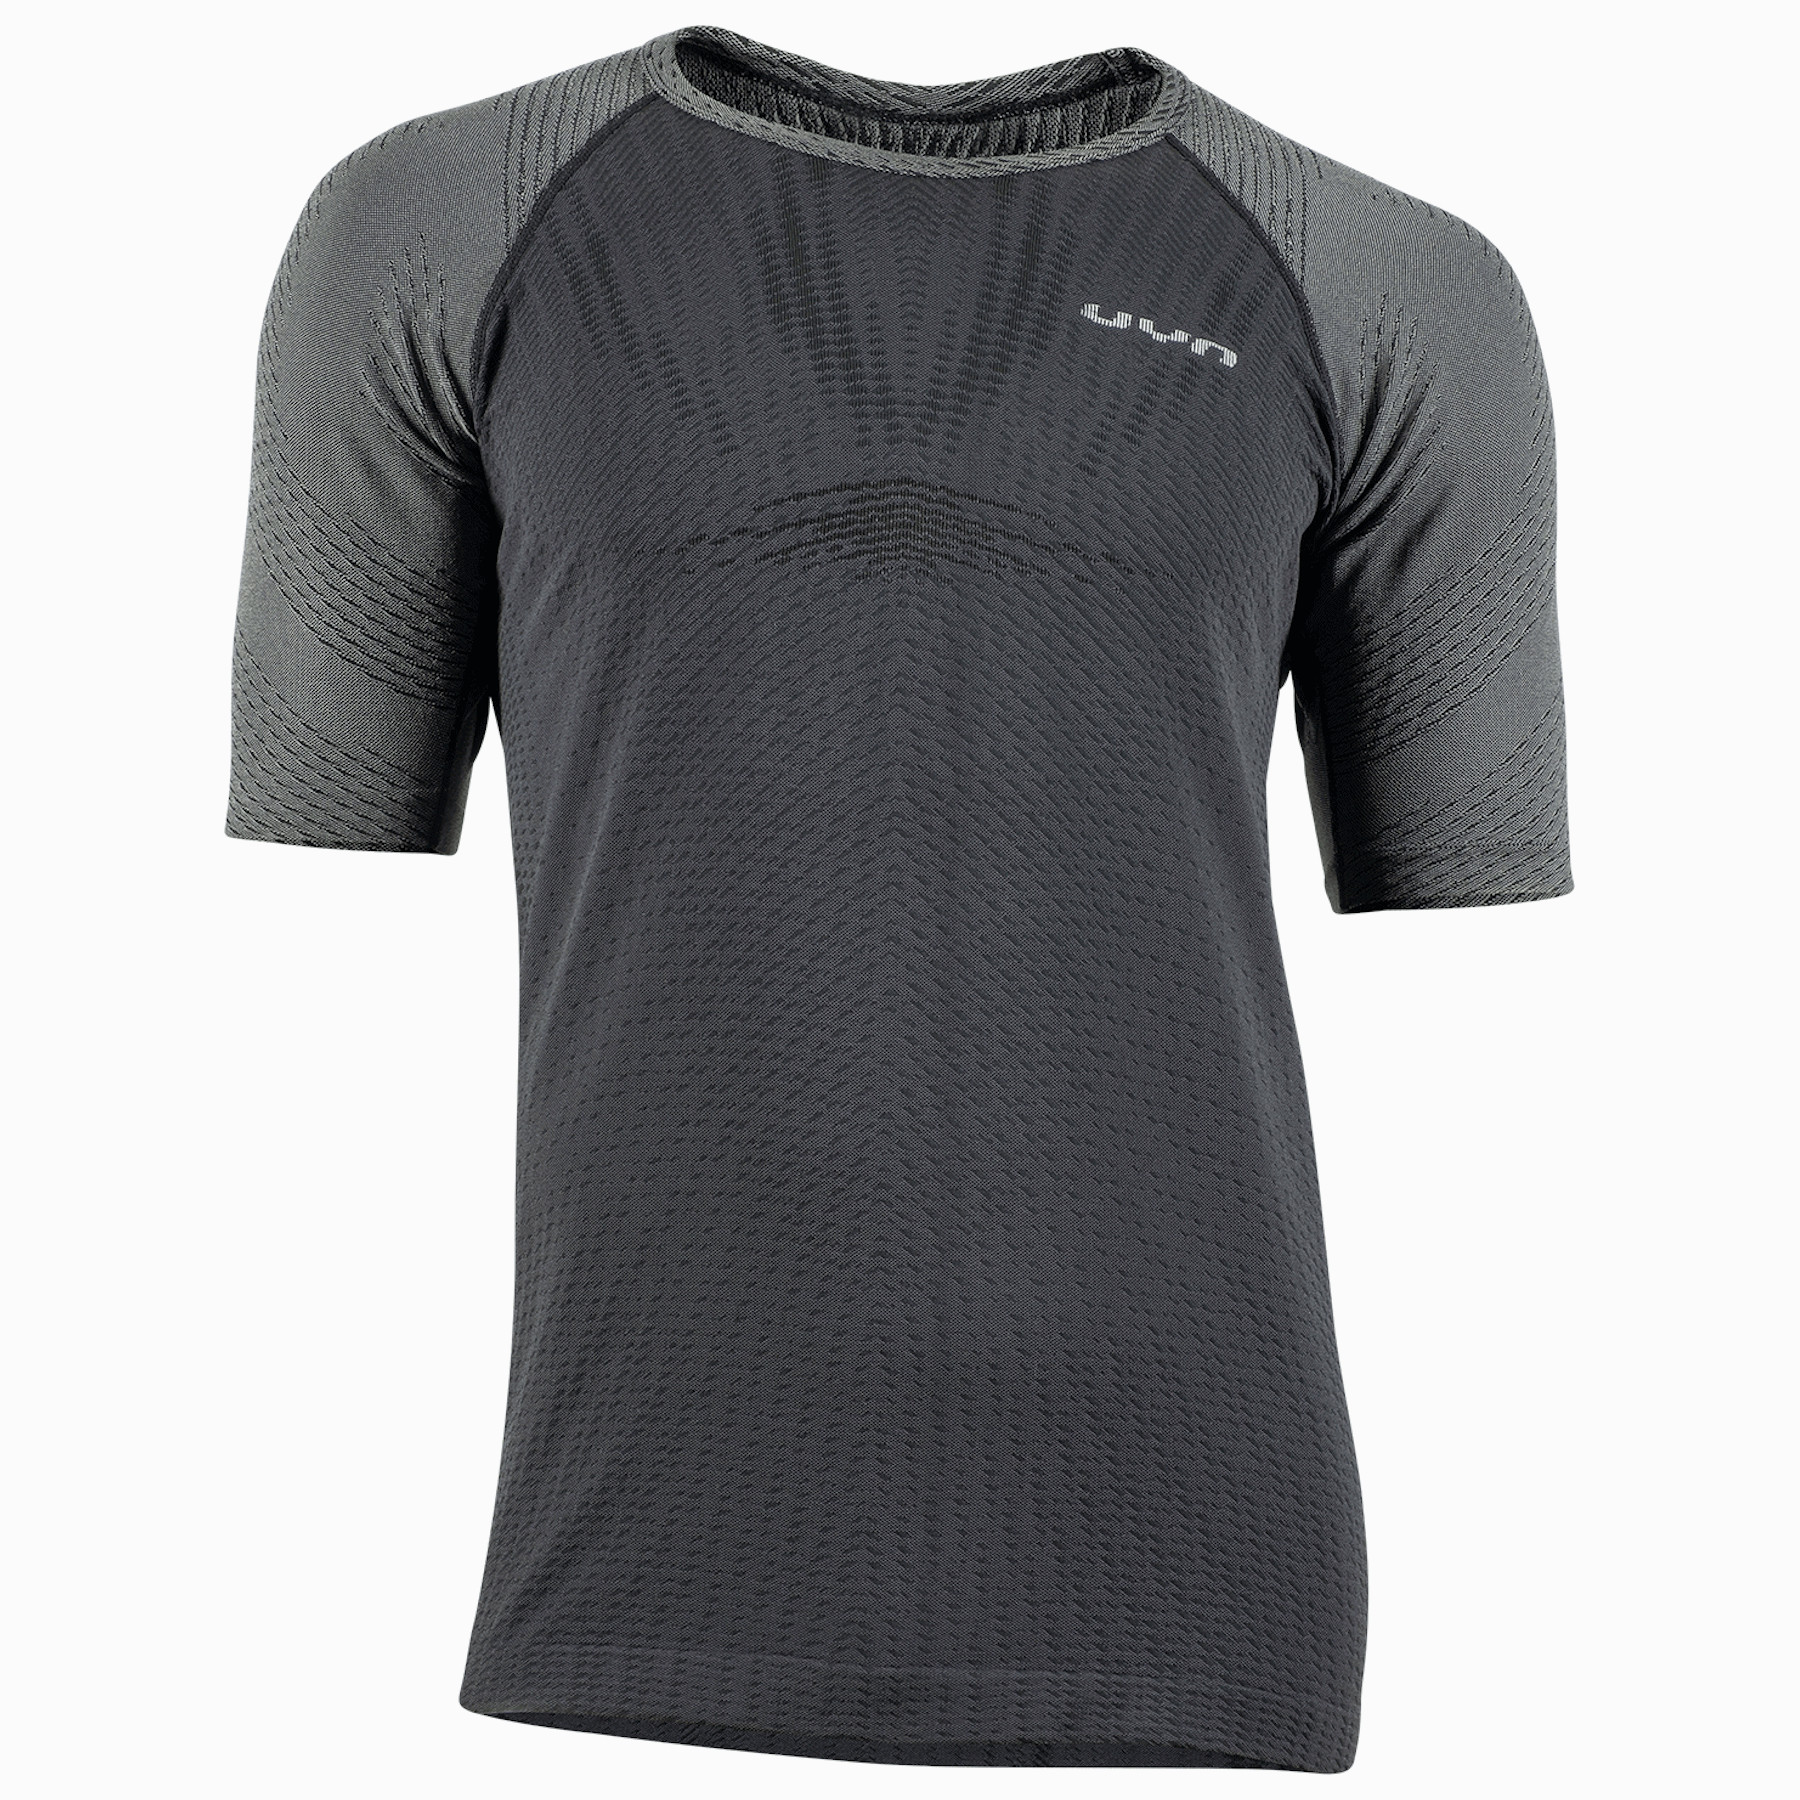 Bild von UYN Activyon Running 2.0 T-Shirt - Nine Iron/Iron Light